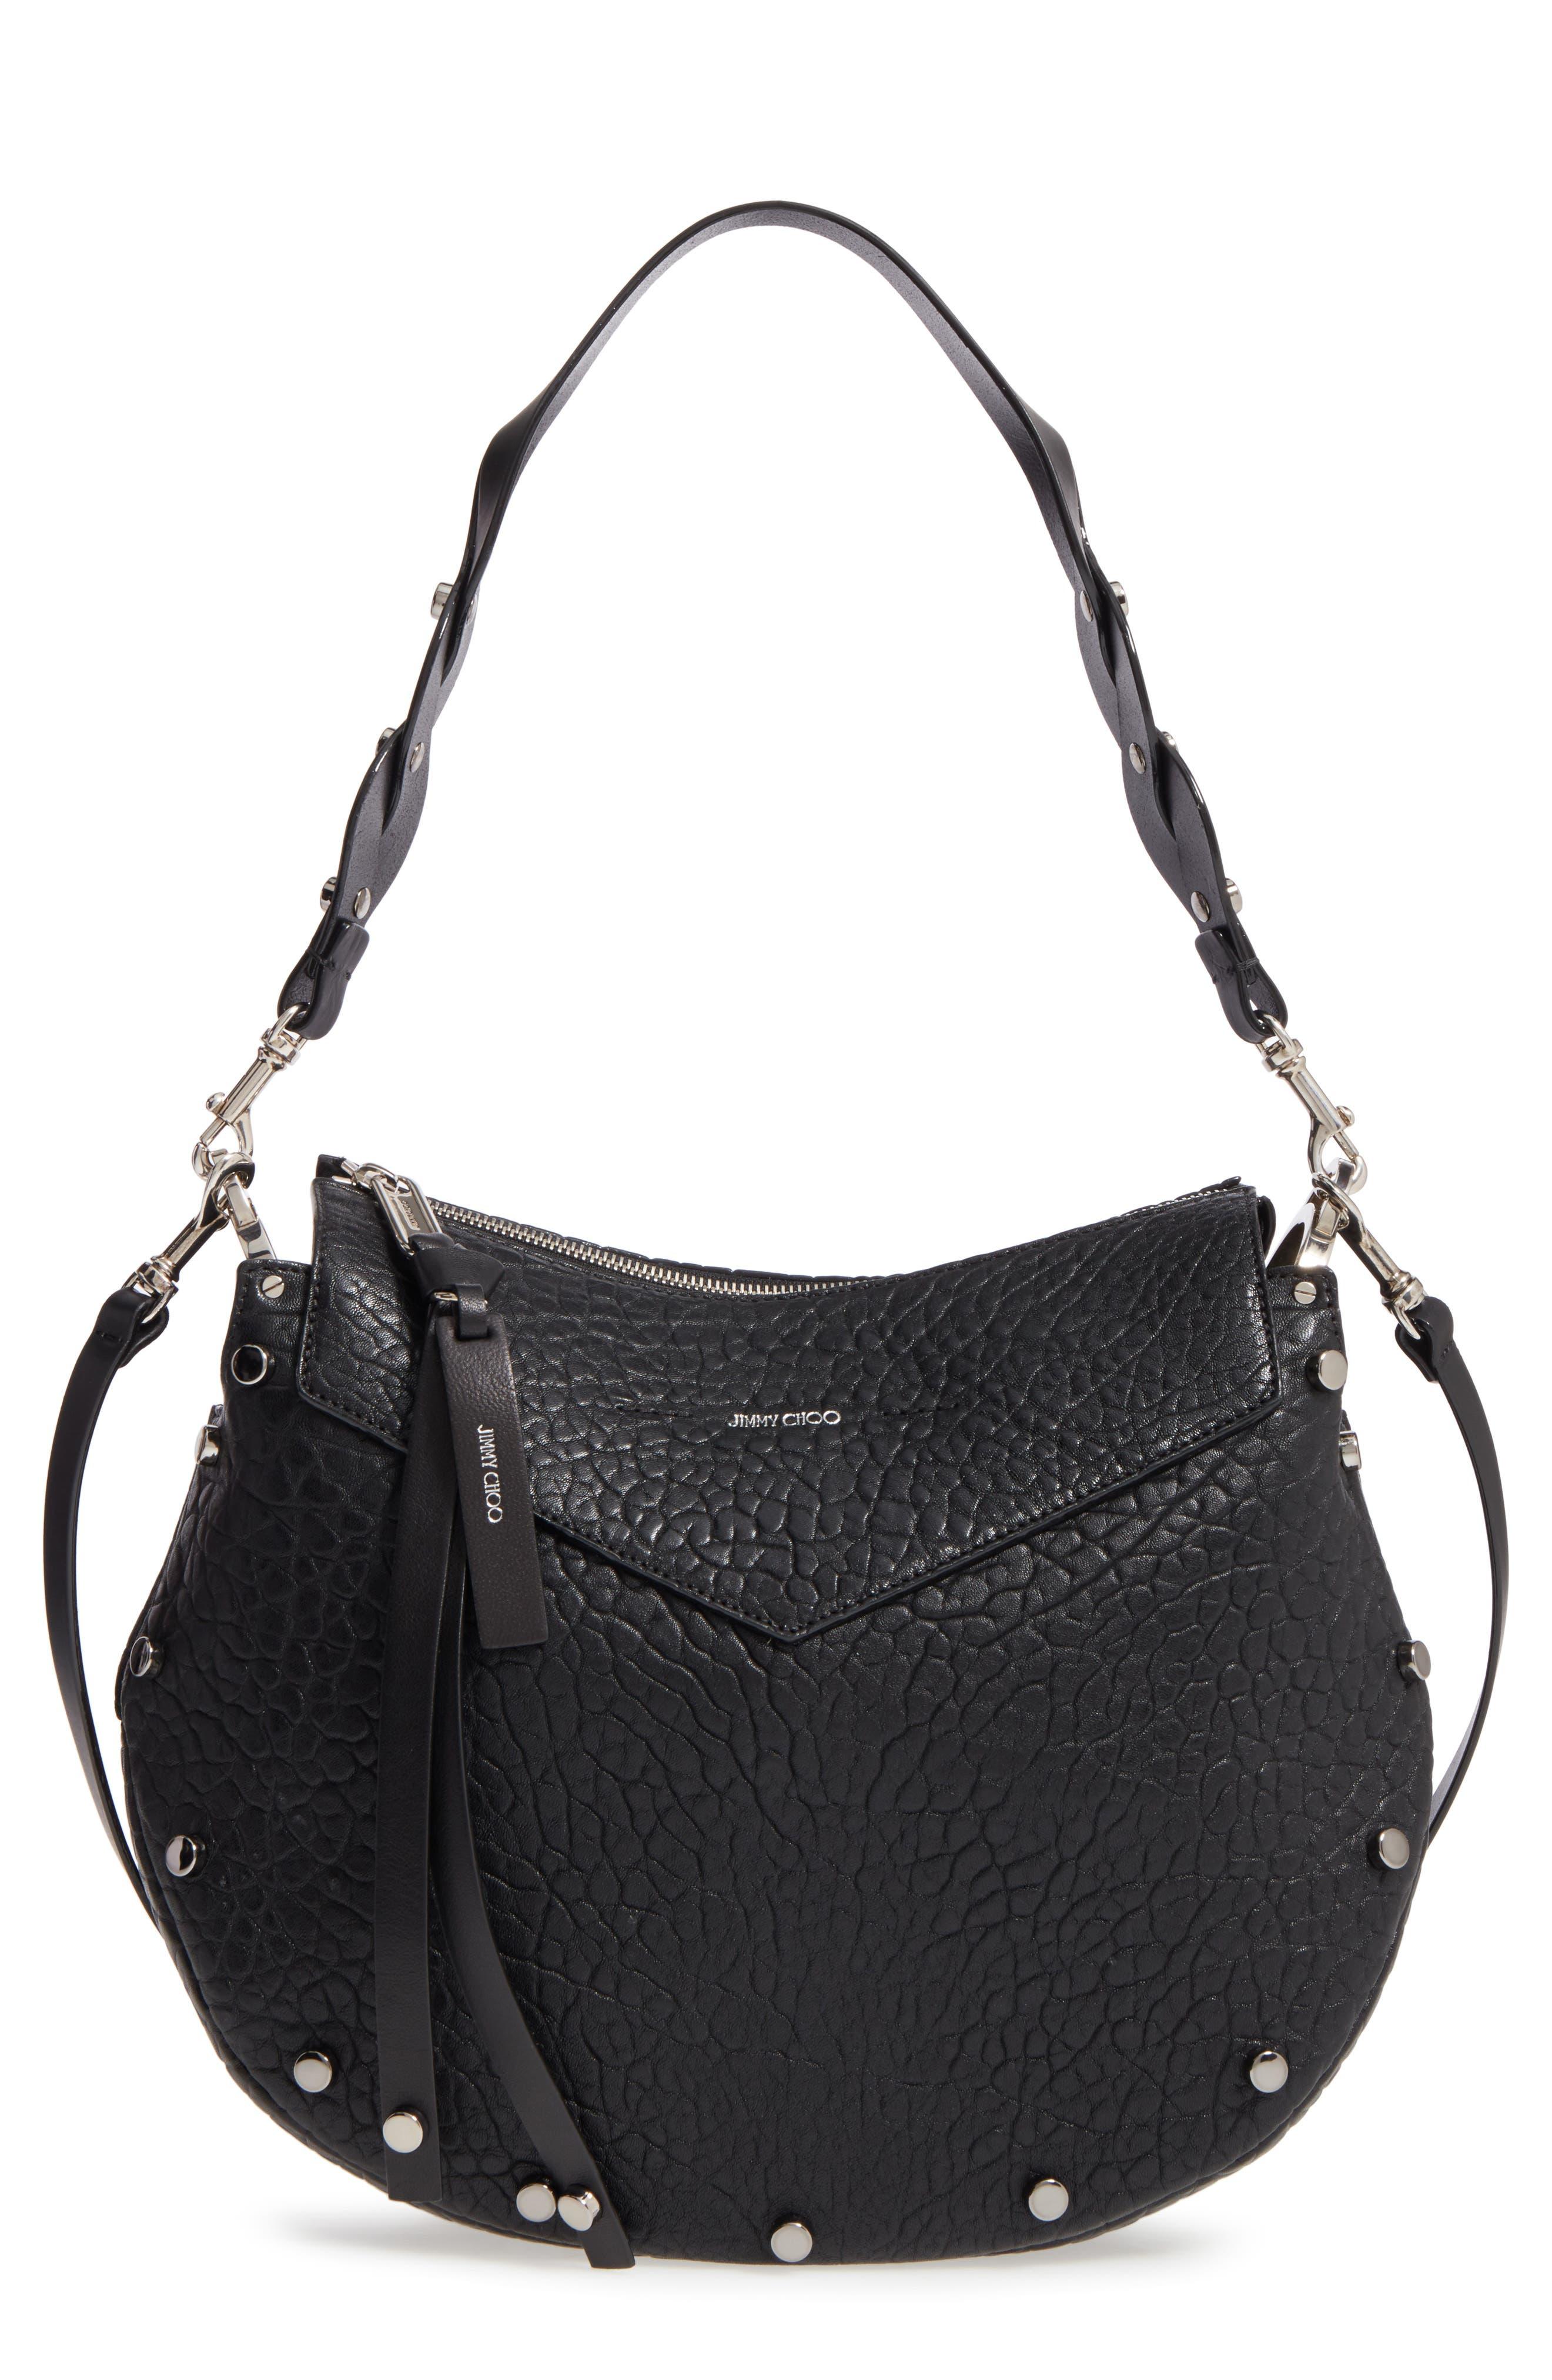 Jimmy Choo Artie Studded Leather Hobo Bag